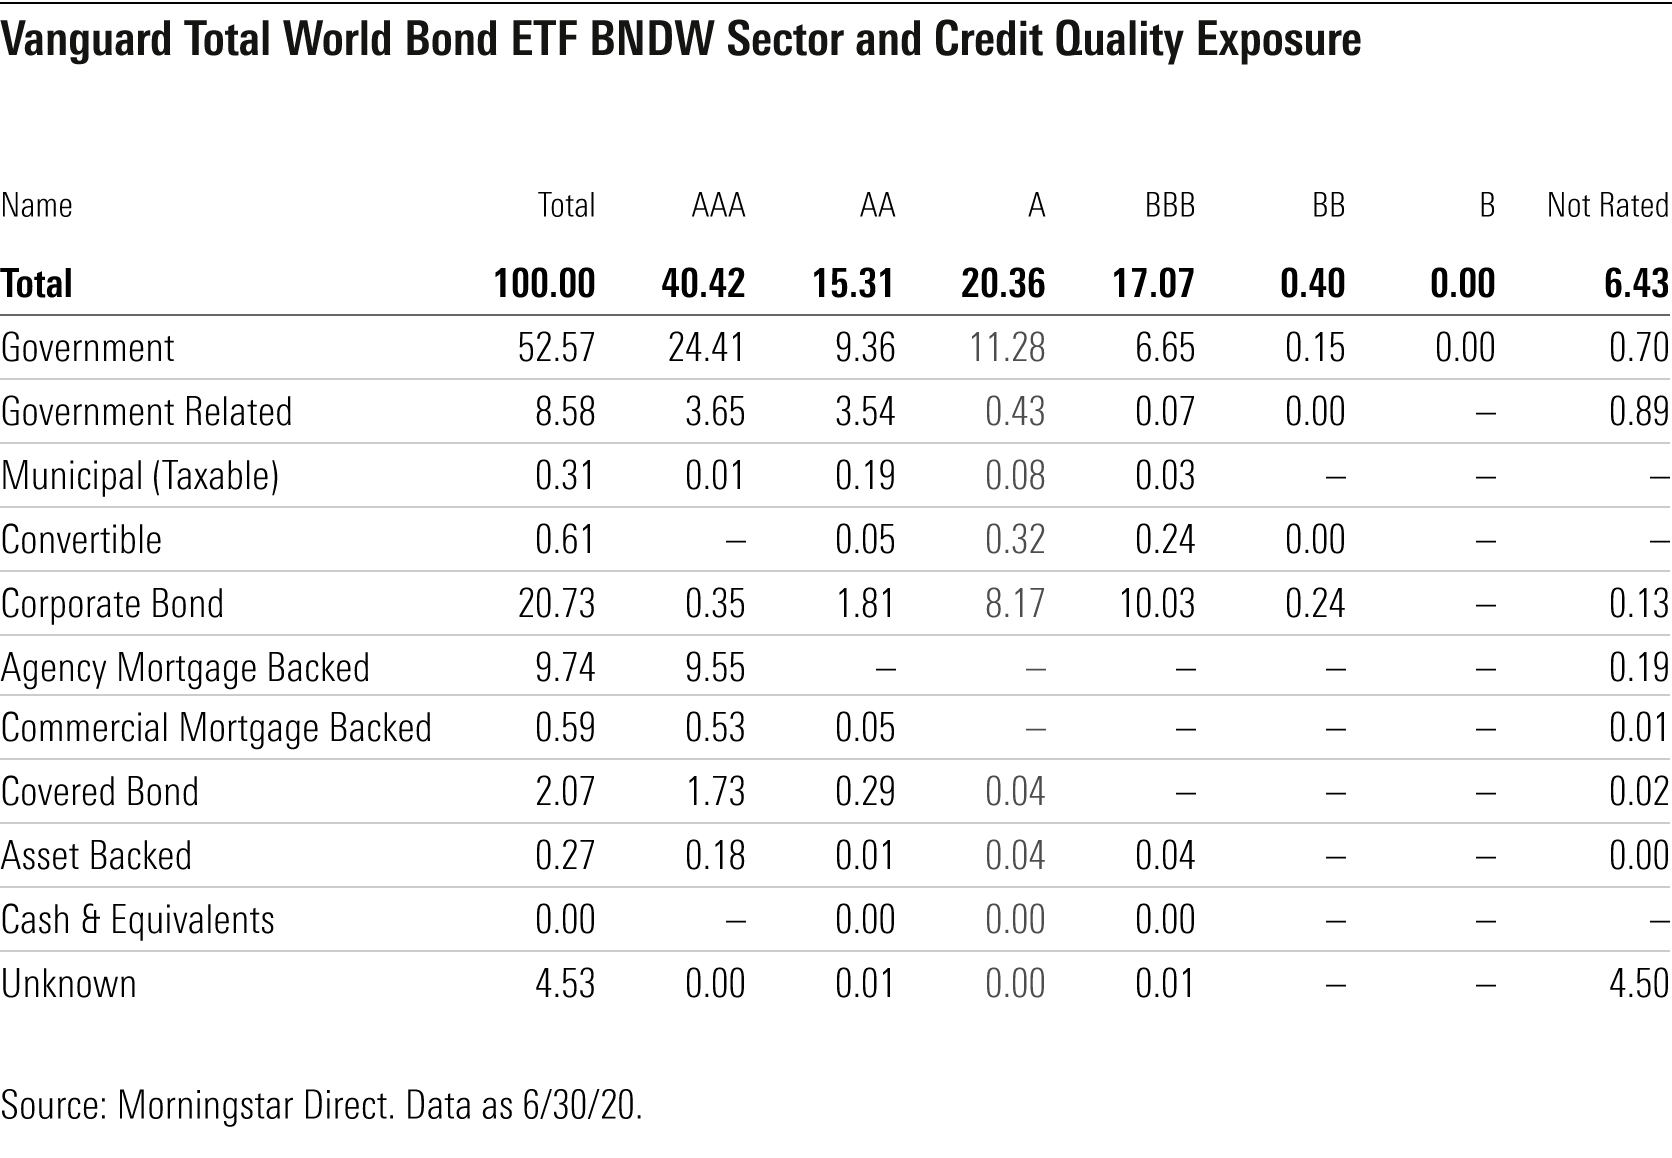 Vanguard Total World